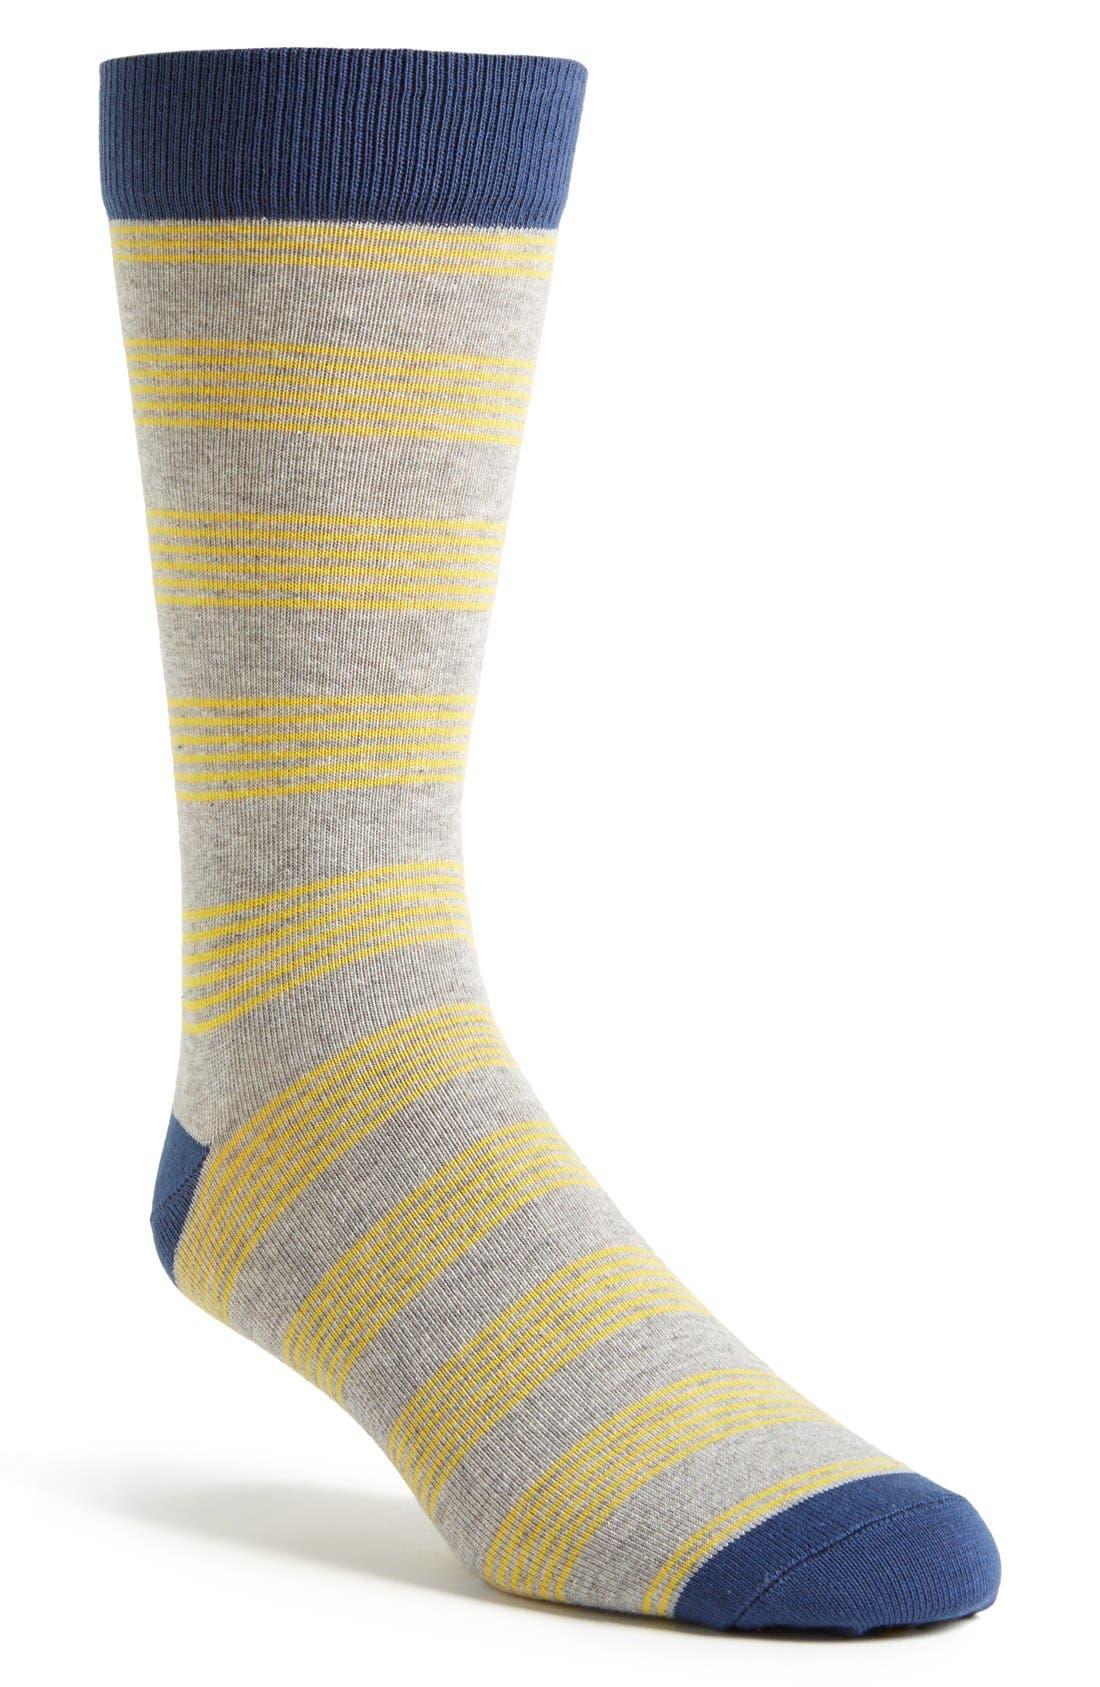 Alternate Image 1 Selected - PACT 'Picnic Stripe' Crew Socks